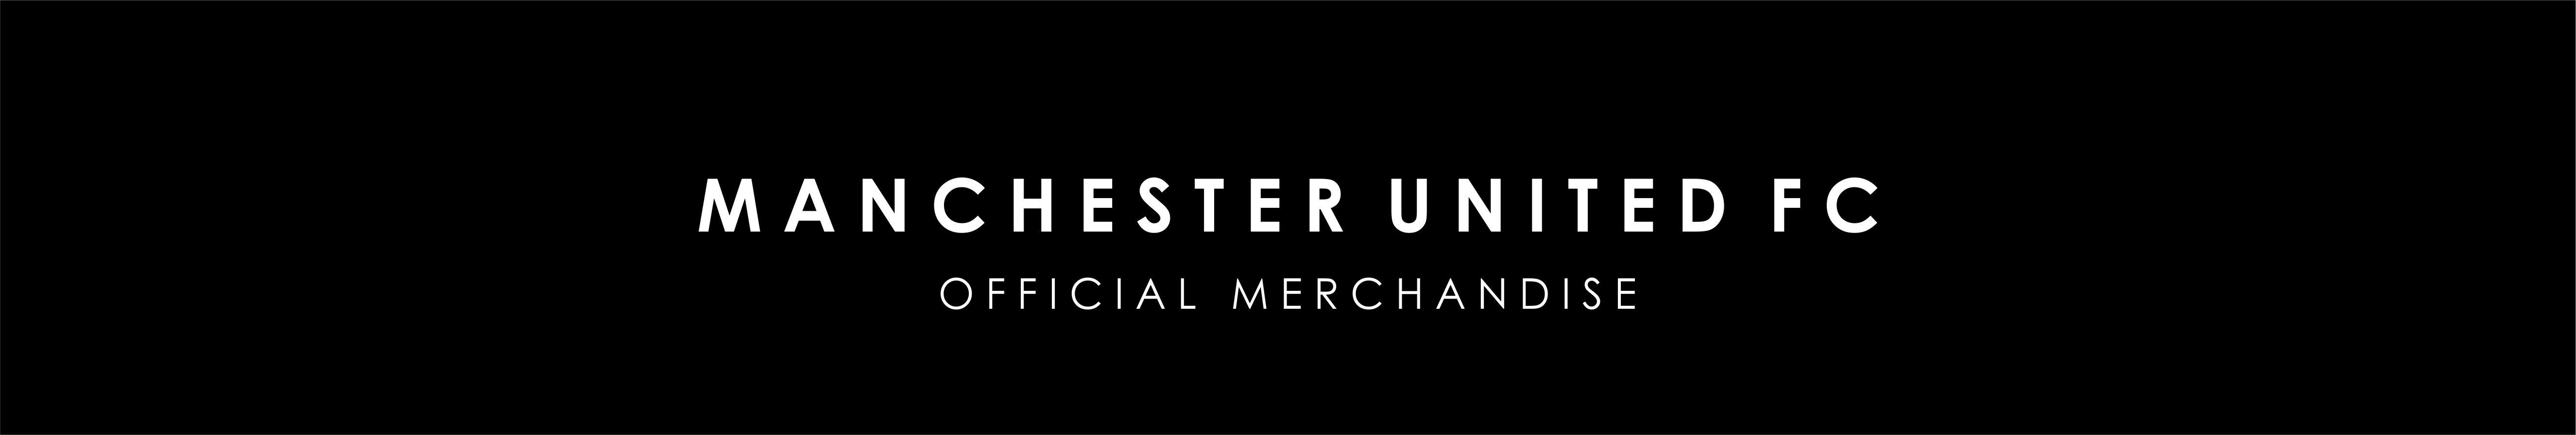 manchester-united-fc.jpg